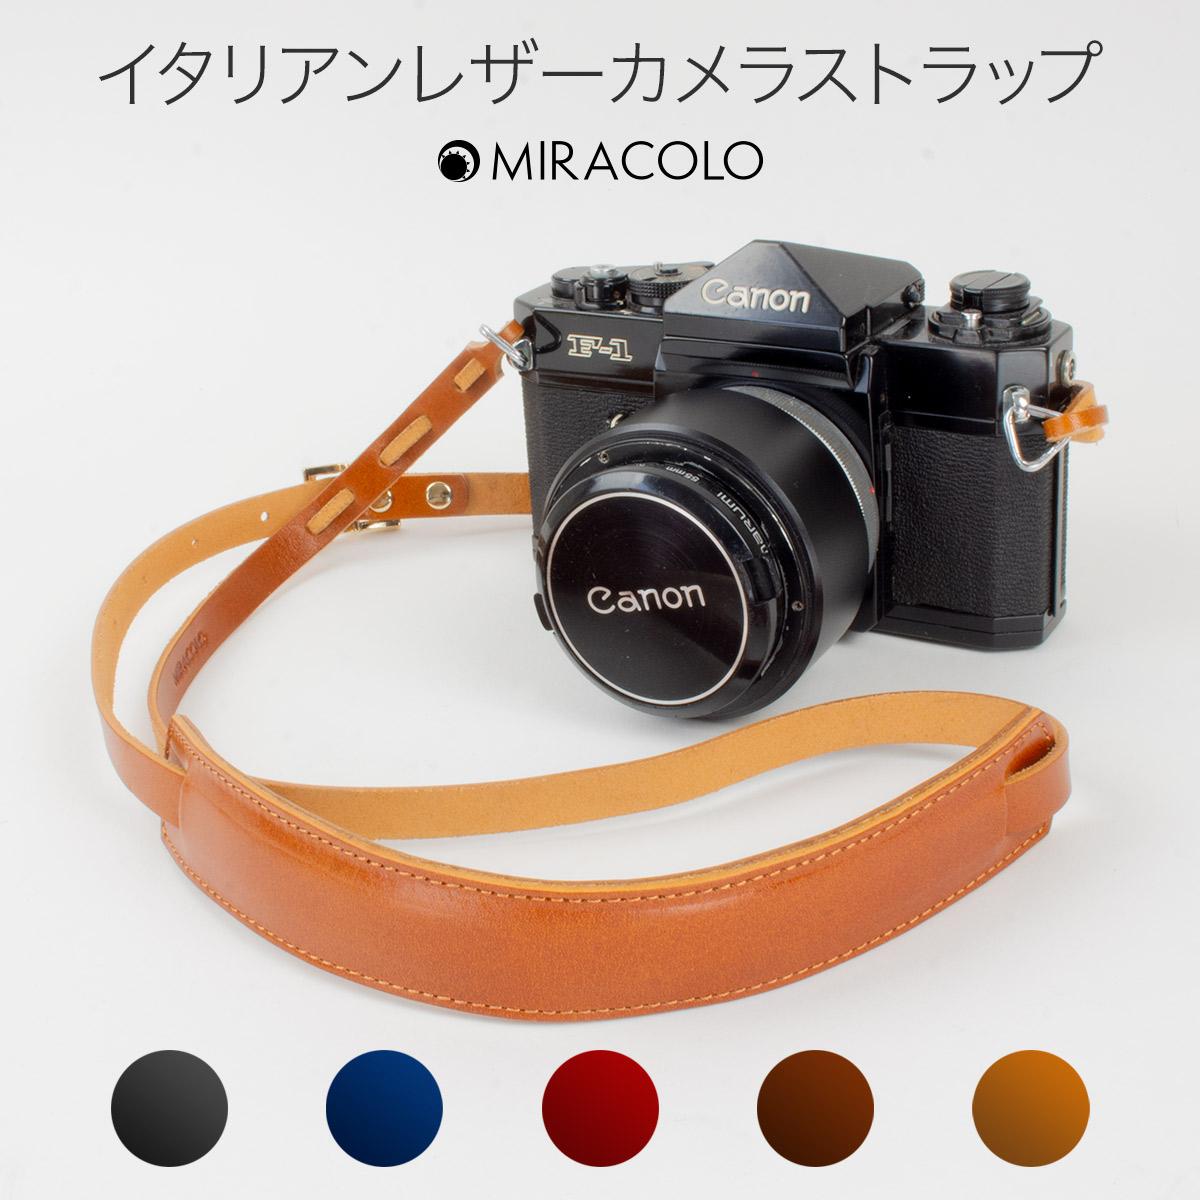 MIRACOLO イタリアンレザー 本革 カメラストラップ サイズ調整アジャスター付き 全5色 ★